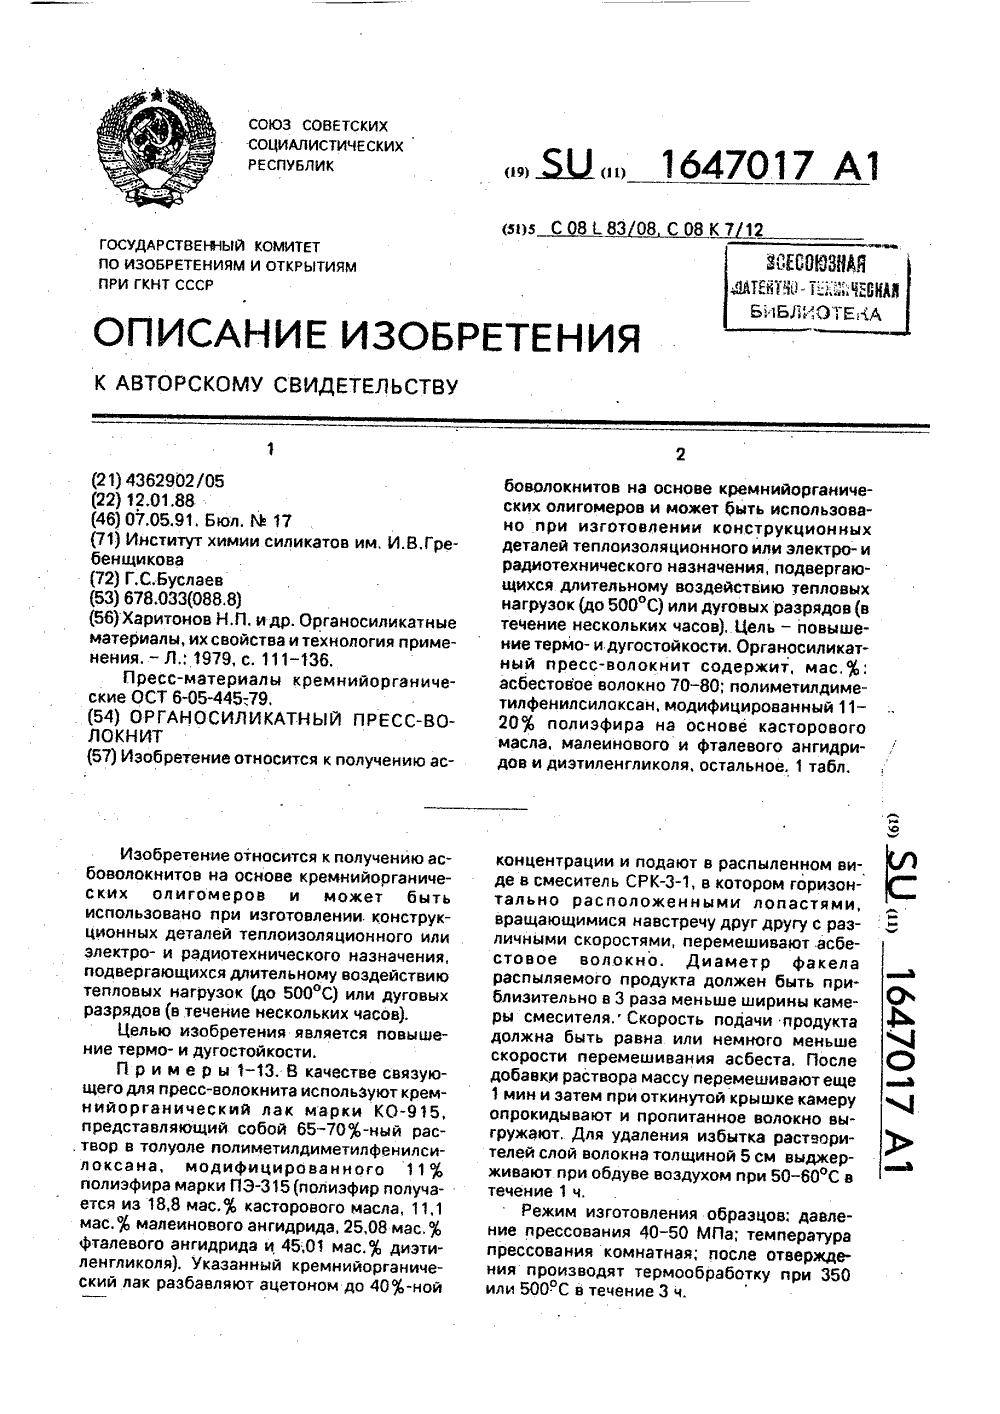 Гост 1479 79 мастика температура применения мастика для натирки полов эдельвакс